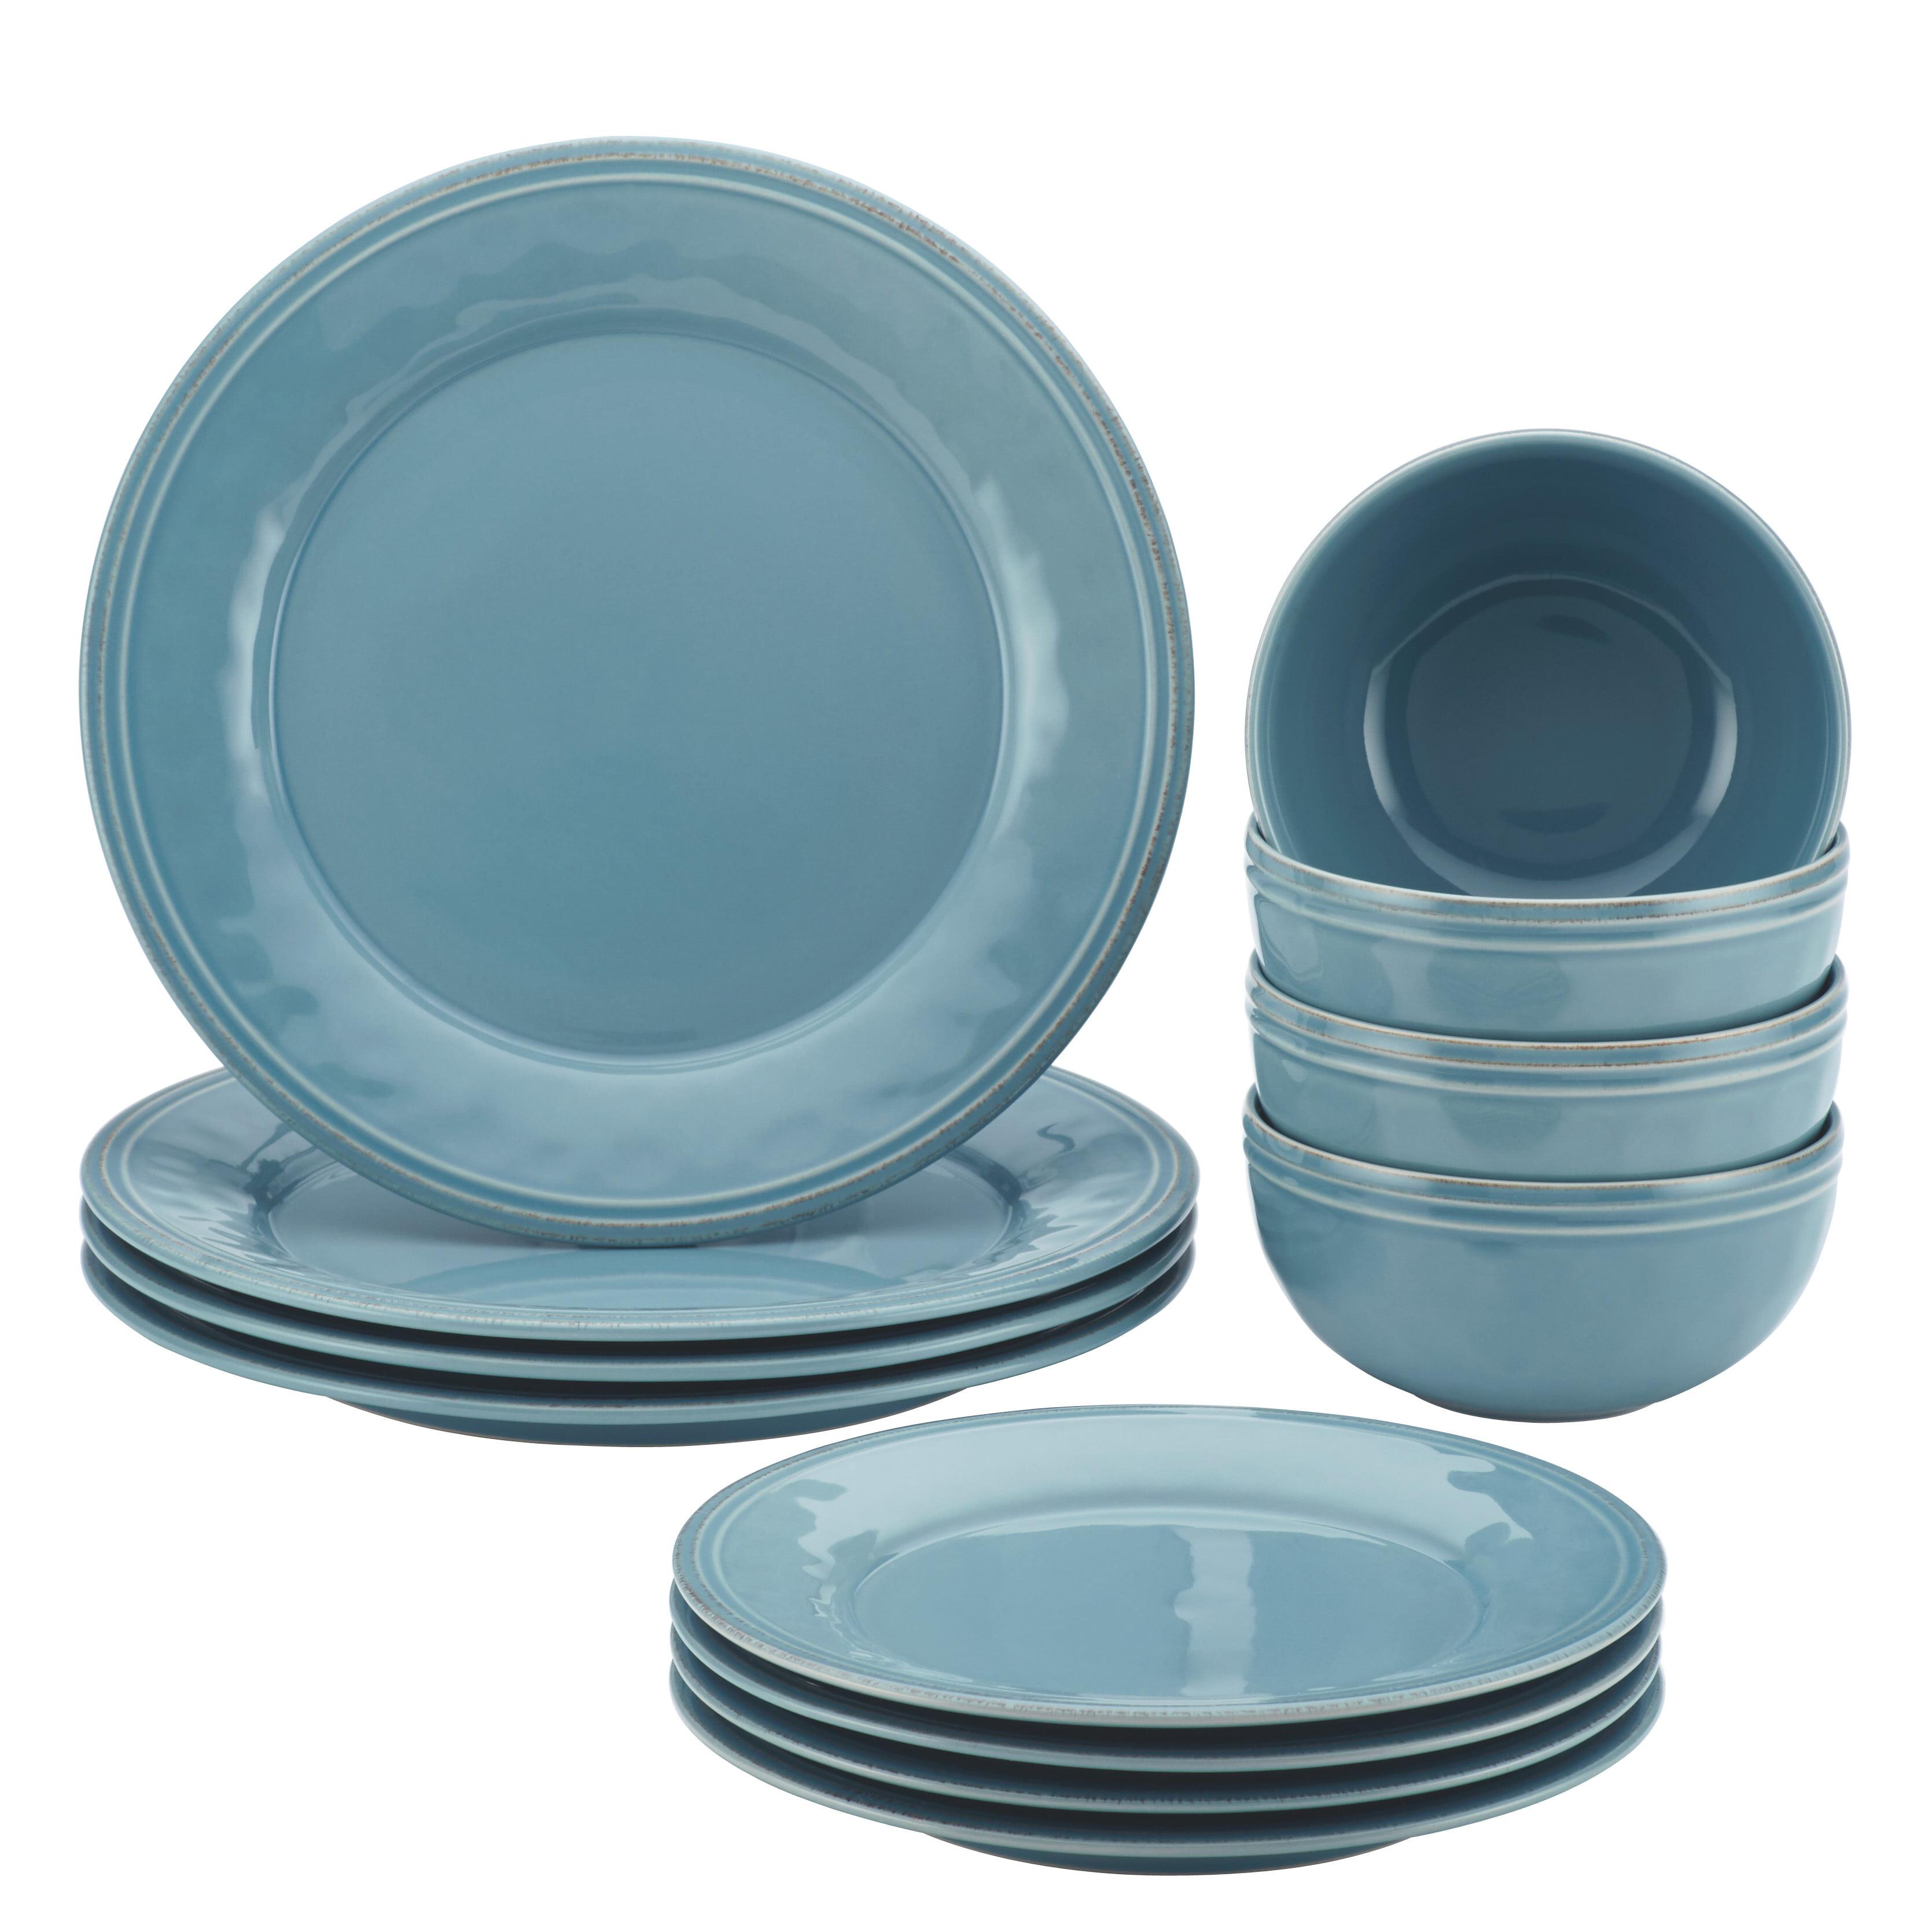 Rachael Ray Cucina 12-Piece Stoneware Dinnerware Set, Agave Blue